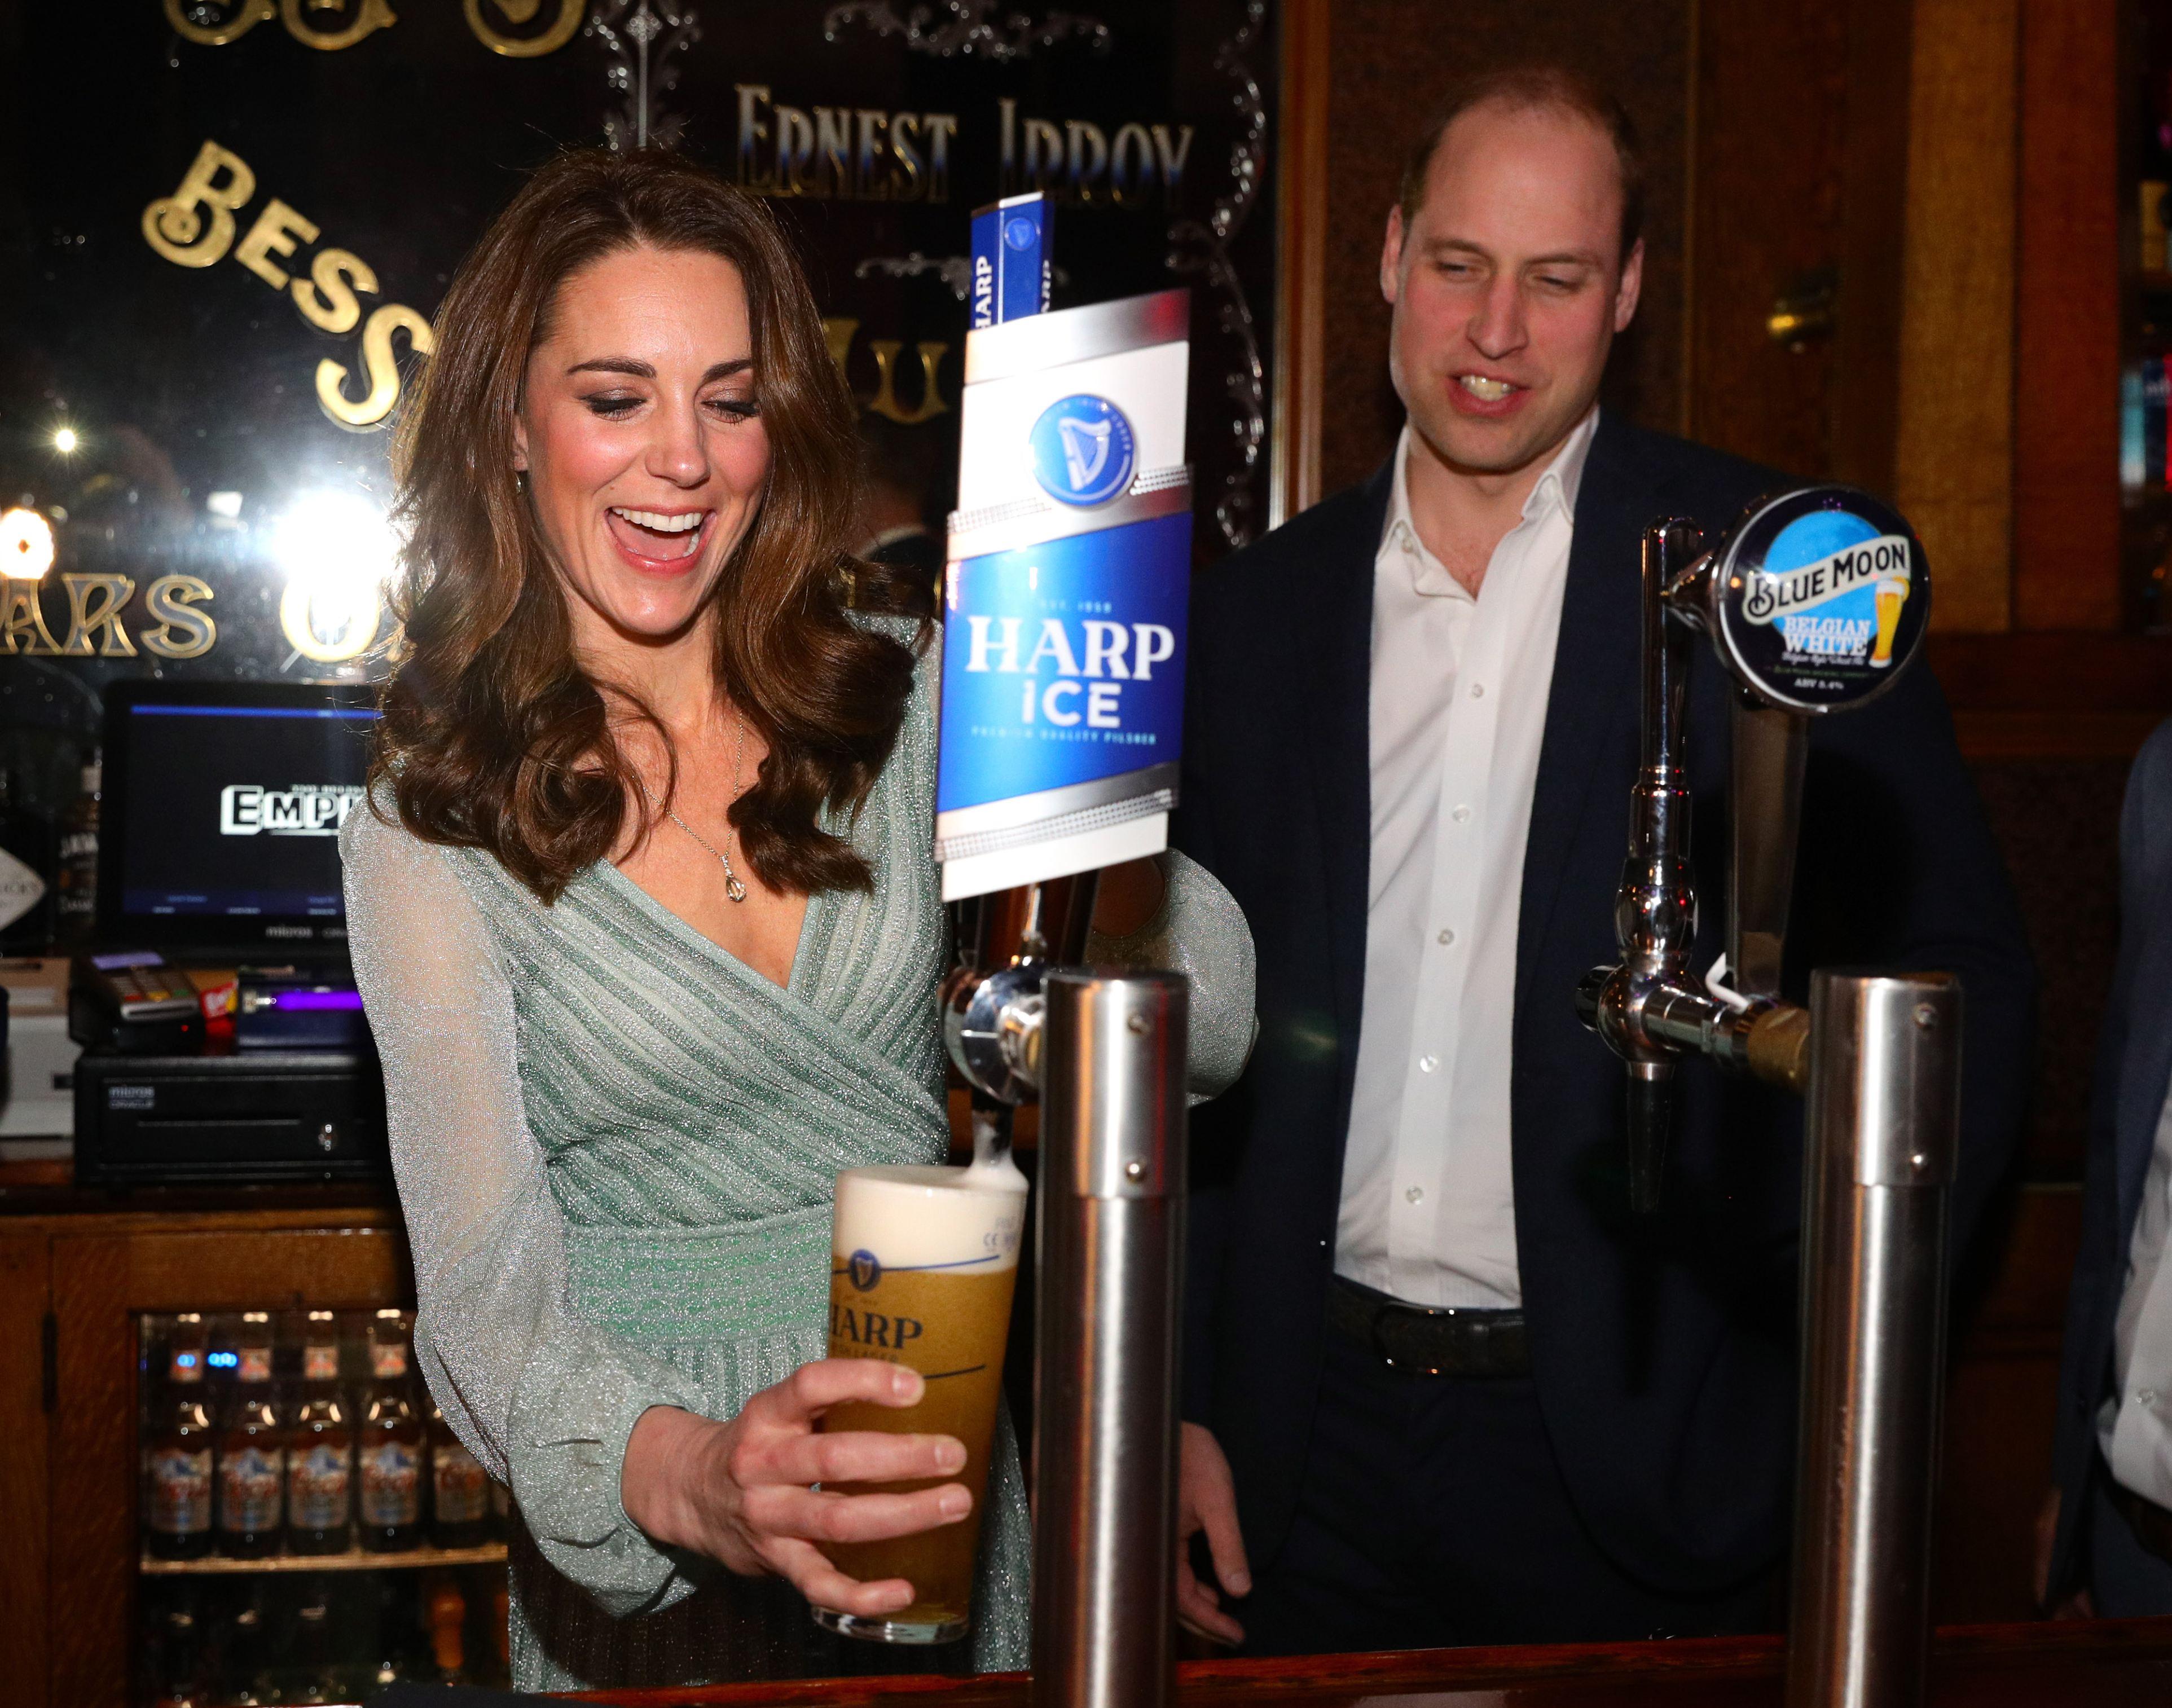 Duke and Duchess of Cambridge visit Northern Ireland